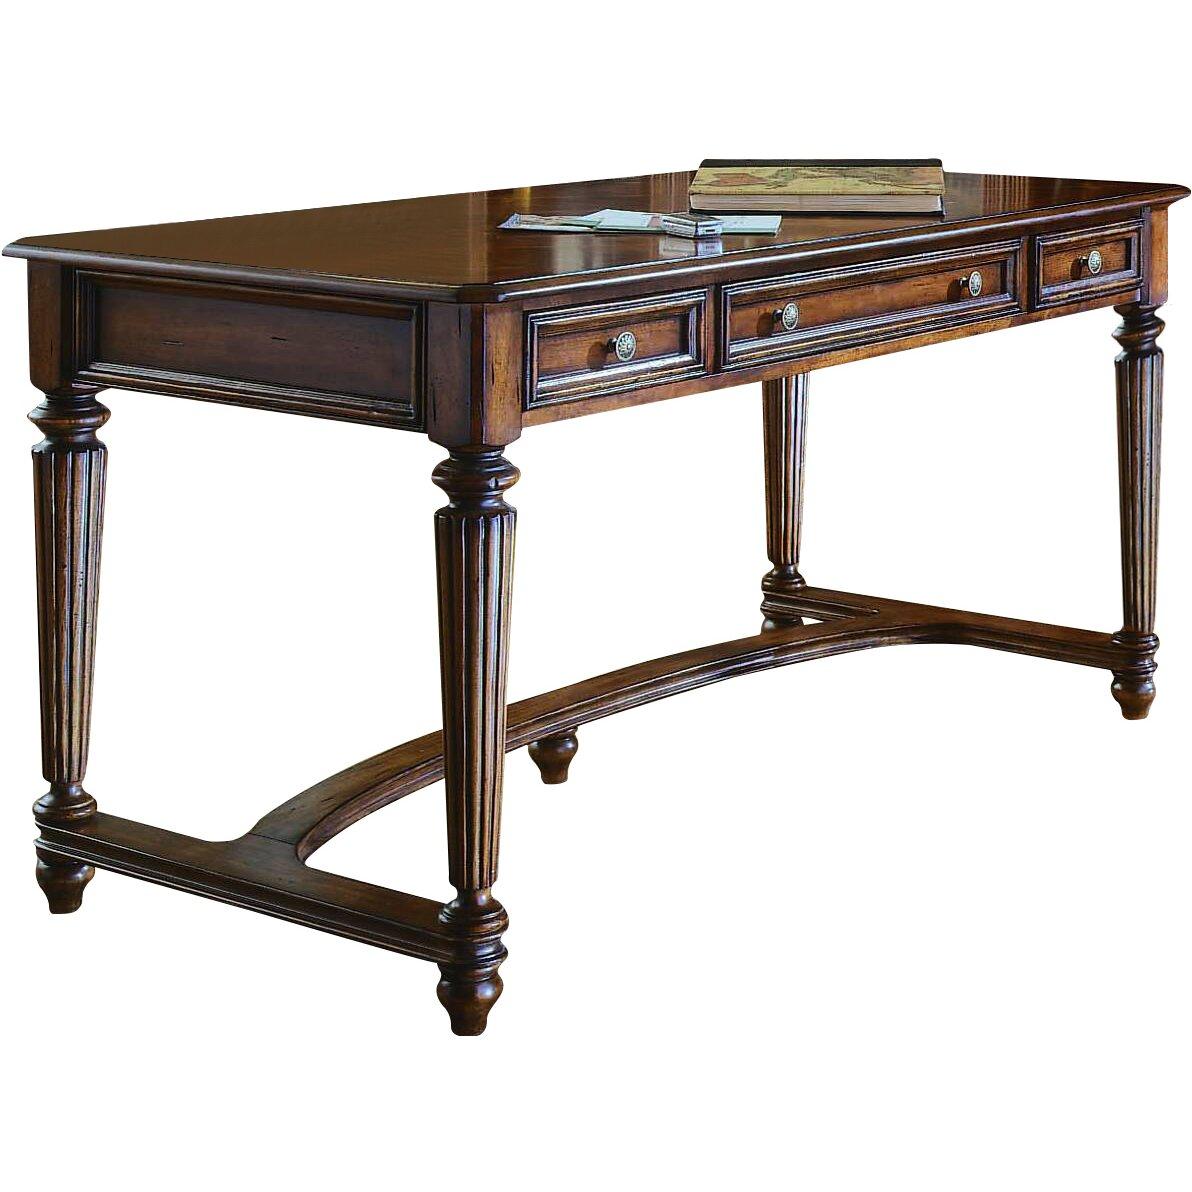 Hooker Furniture Brookhaven Keyboard Tray Writing Desk